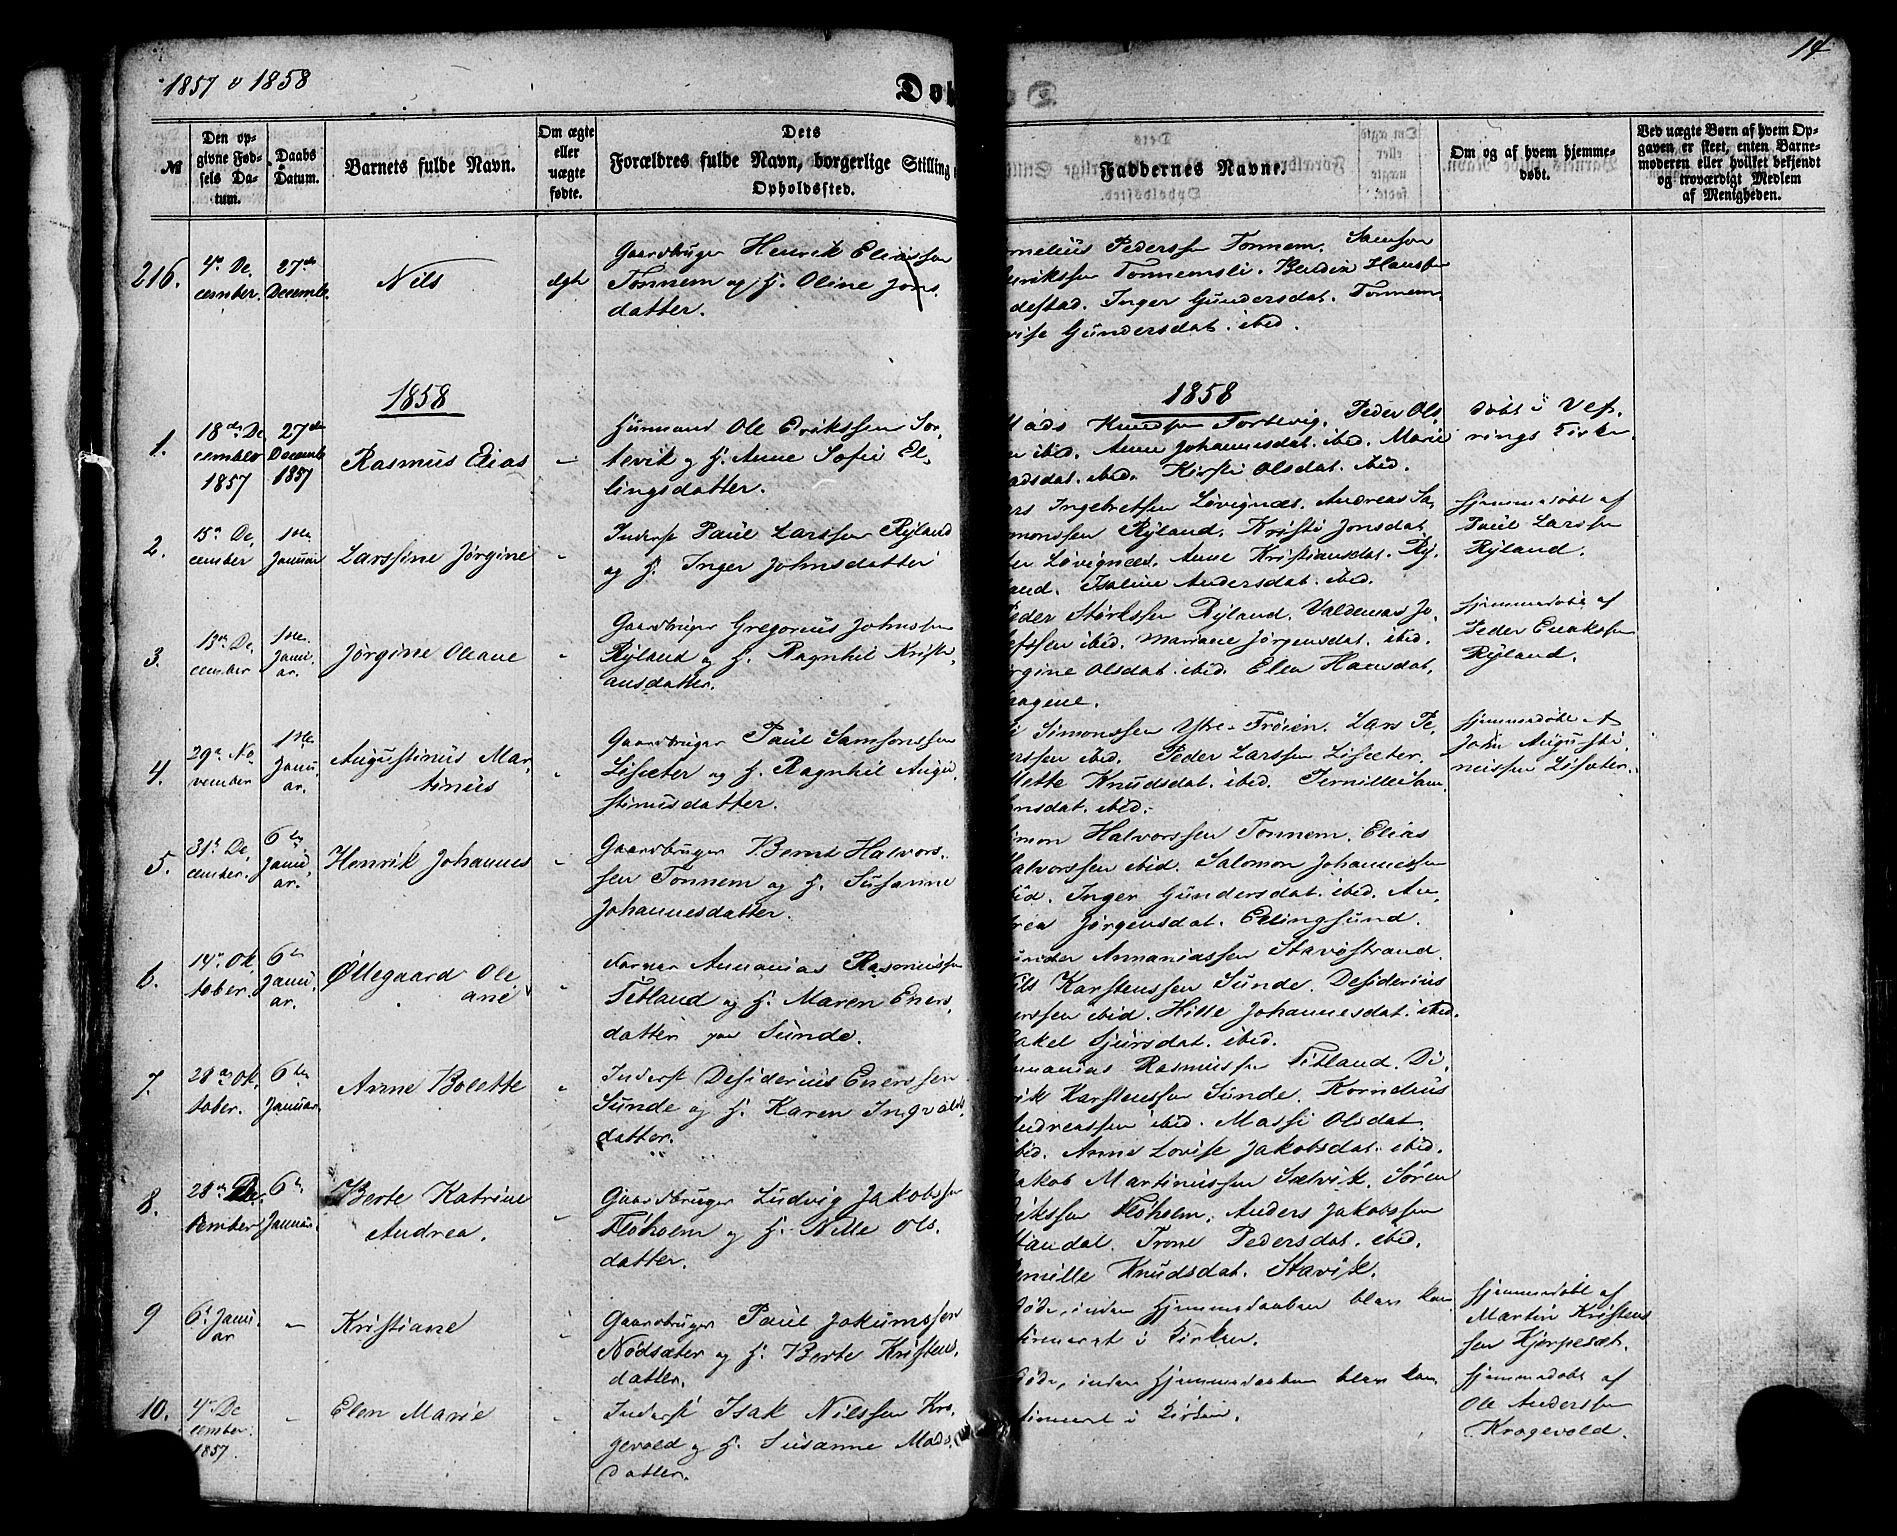 SAB, Kinn sokneprestembete, H/Haa/Haaa/L0006: Ministerialbok nr. A 6, 1857-1885, s. 14